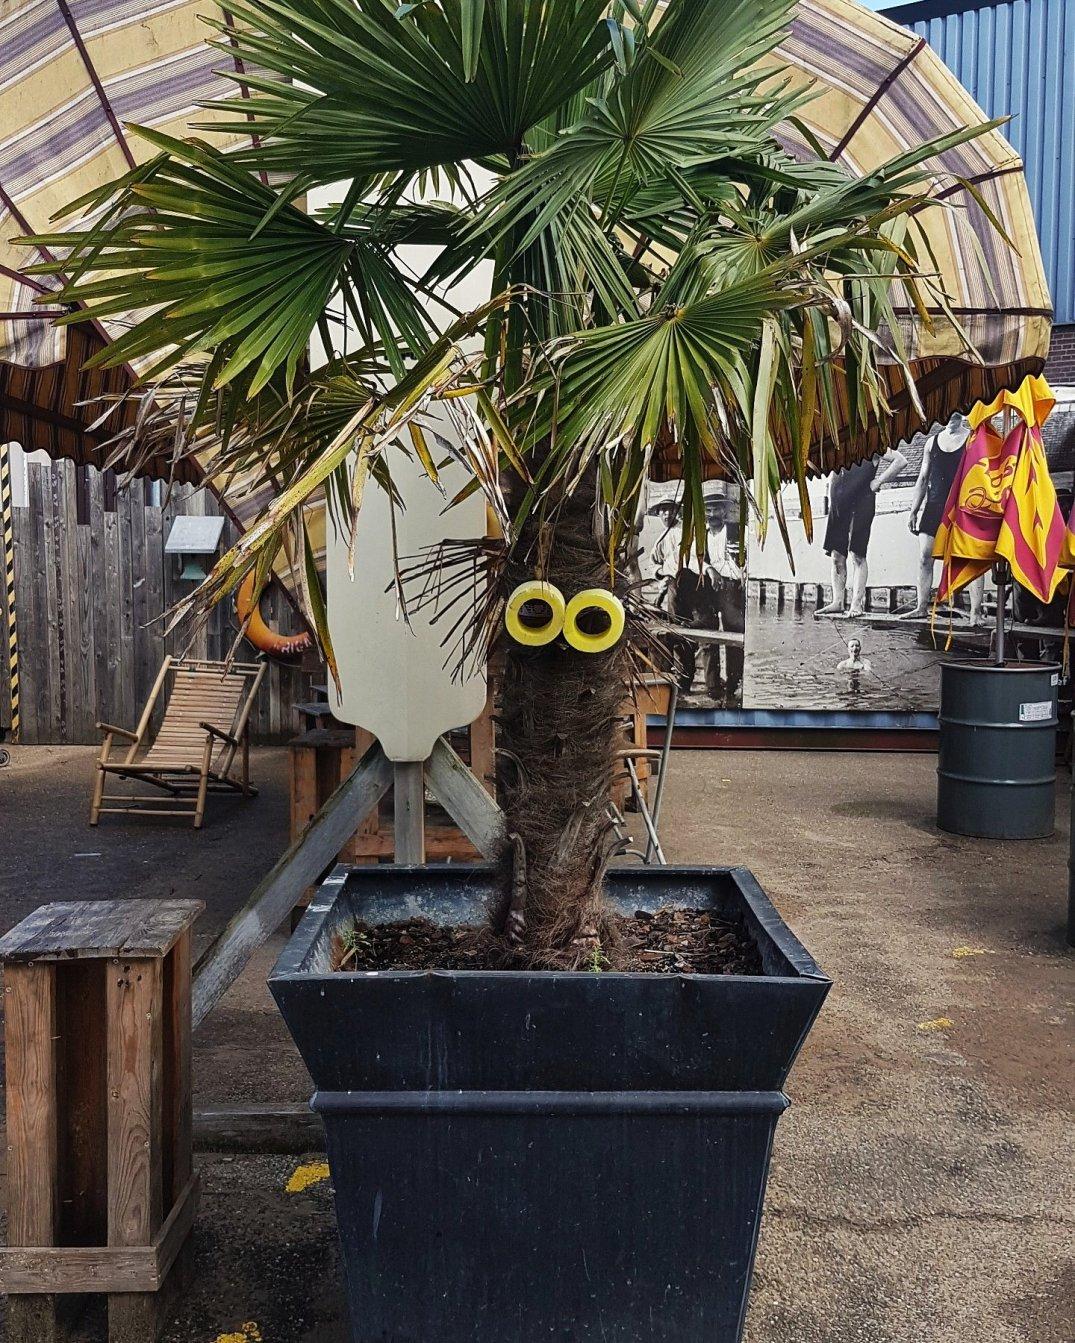 Foomp palmboom